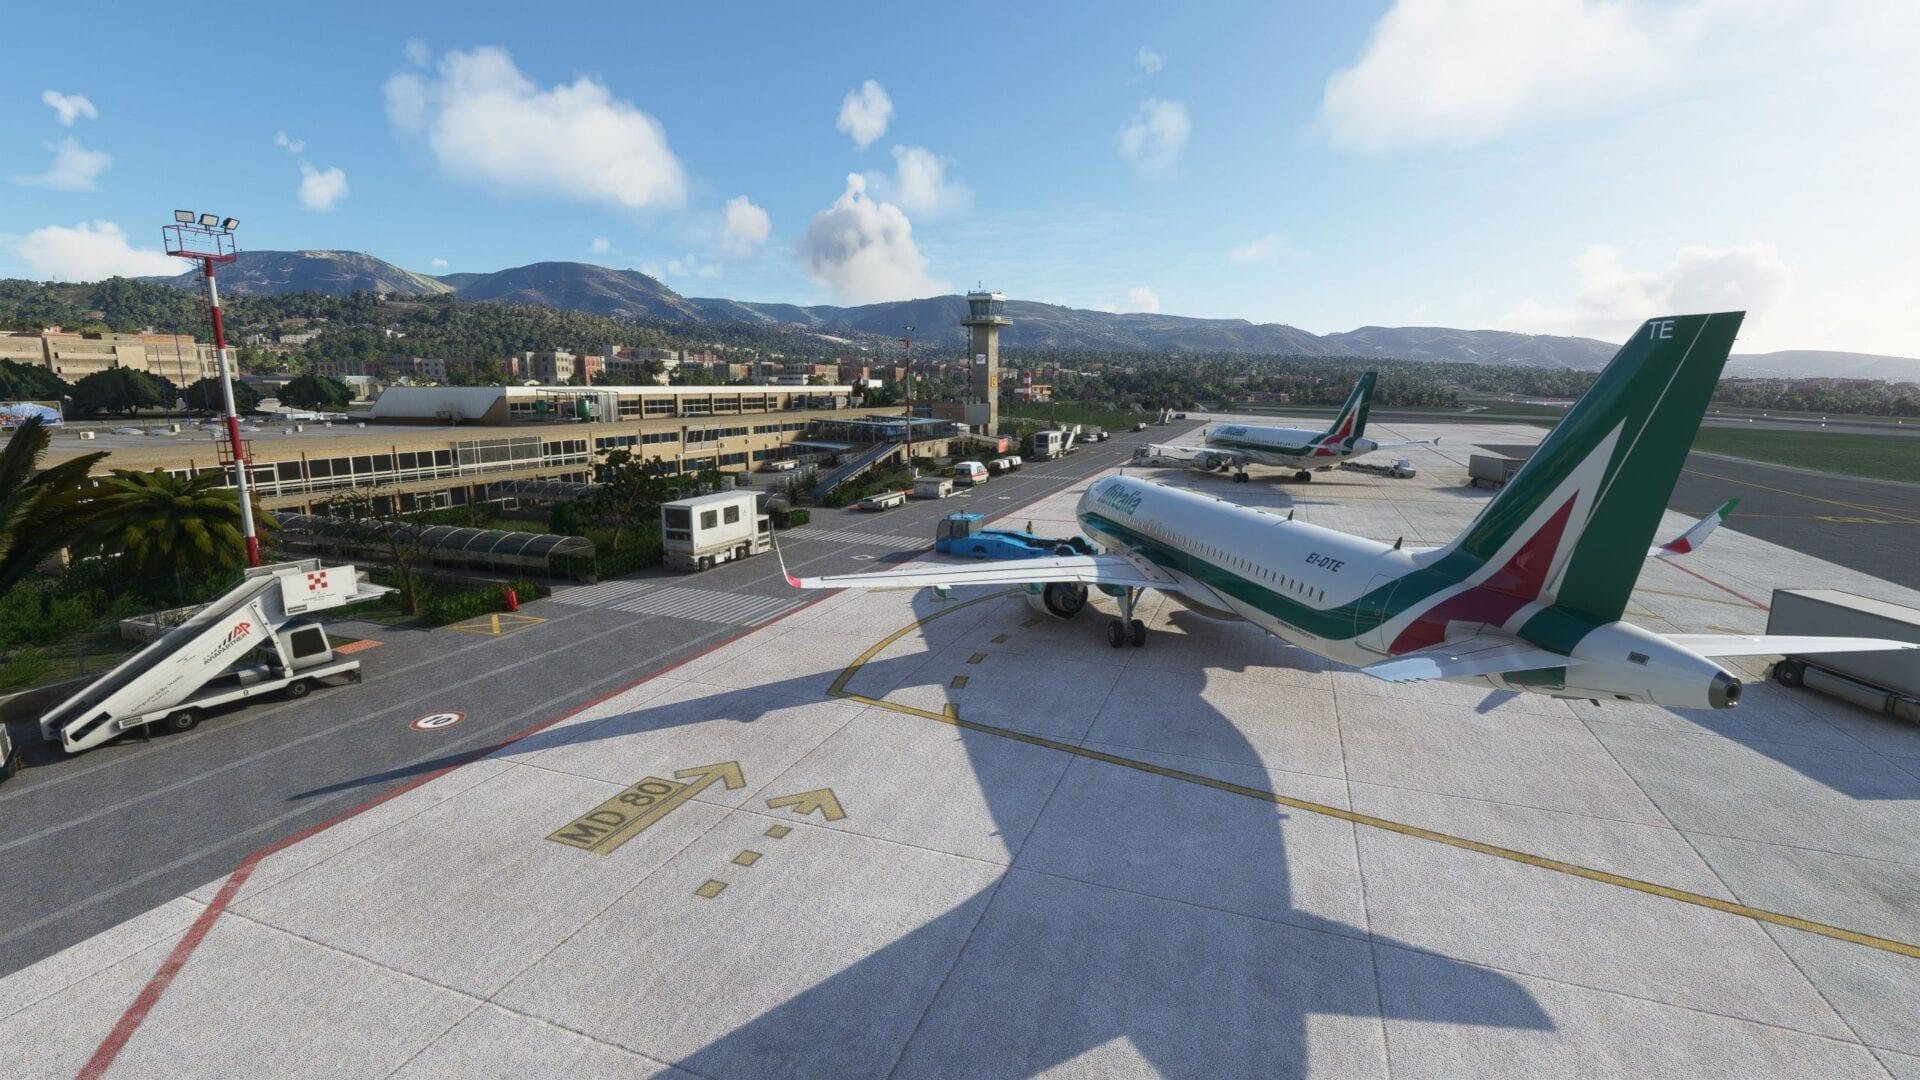 Reggio Calabria Airport for Microsoft Flight Simulator Critic Review